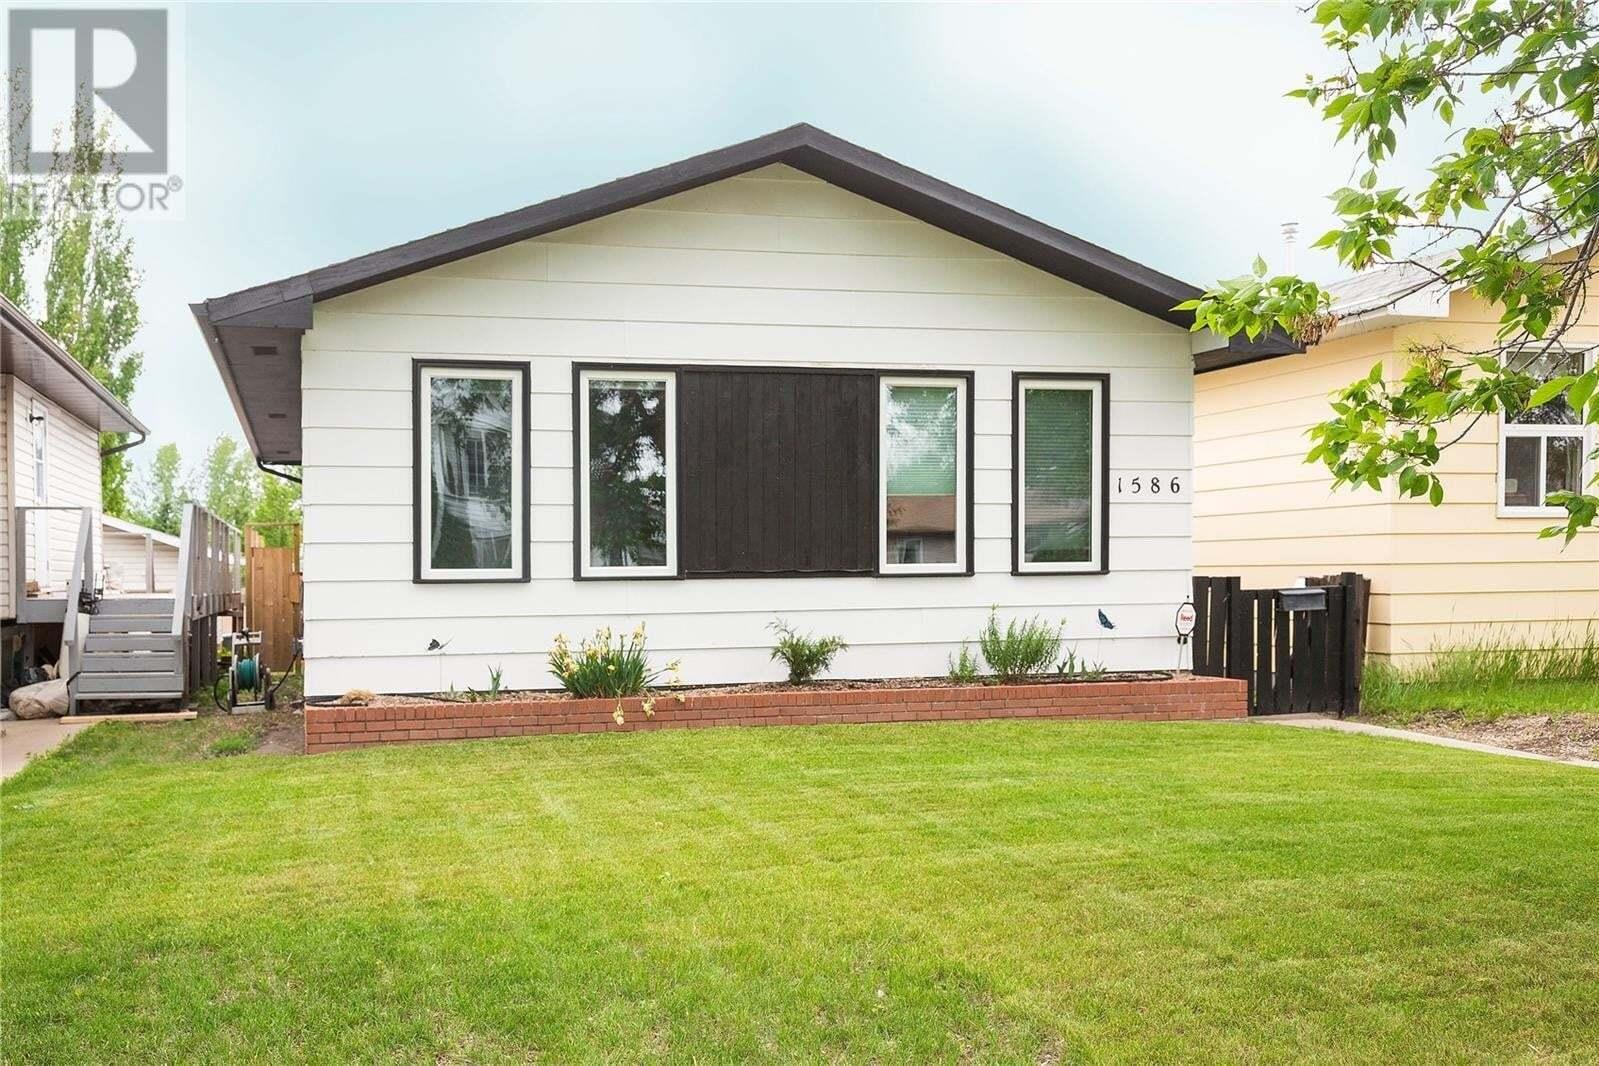 House for sale at 1586 Mcintosh Dr Prince Albert Saskatchewan - MLS: SK813484